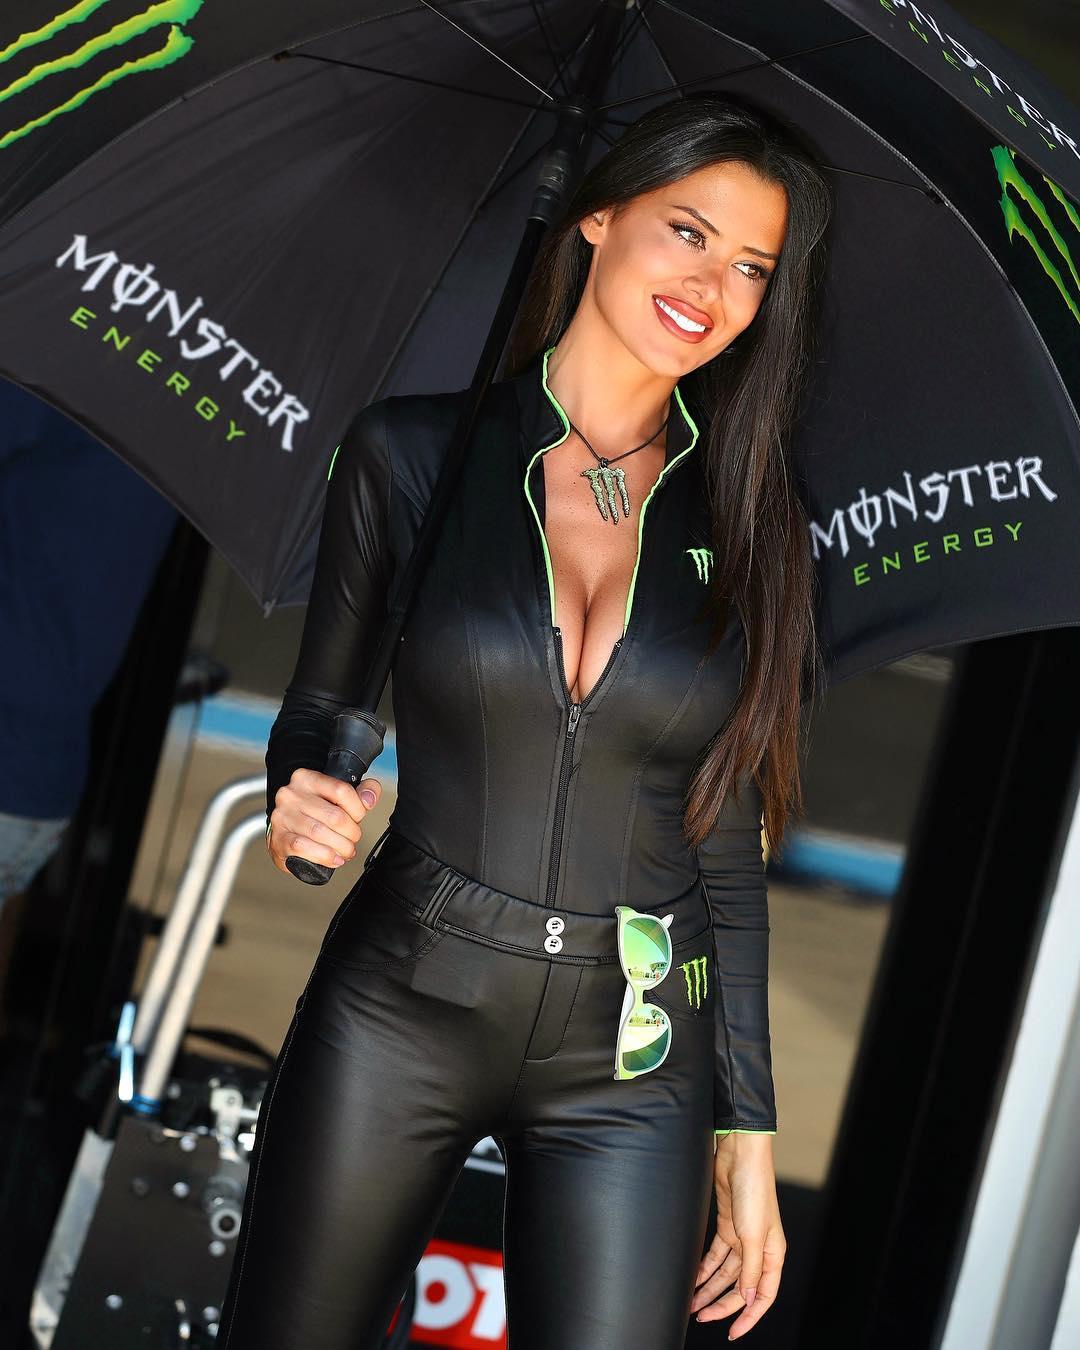 To je pošastnica, ki bi rada omrežila Cristiana Ronalda   Nova24TV